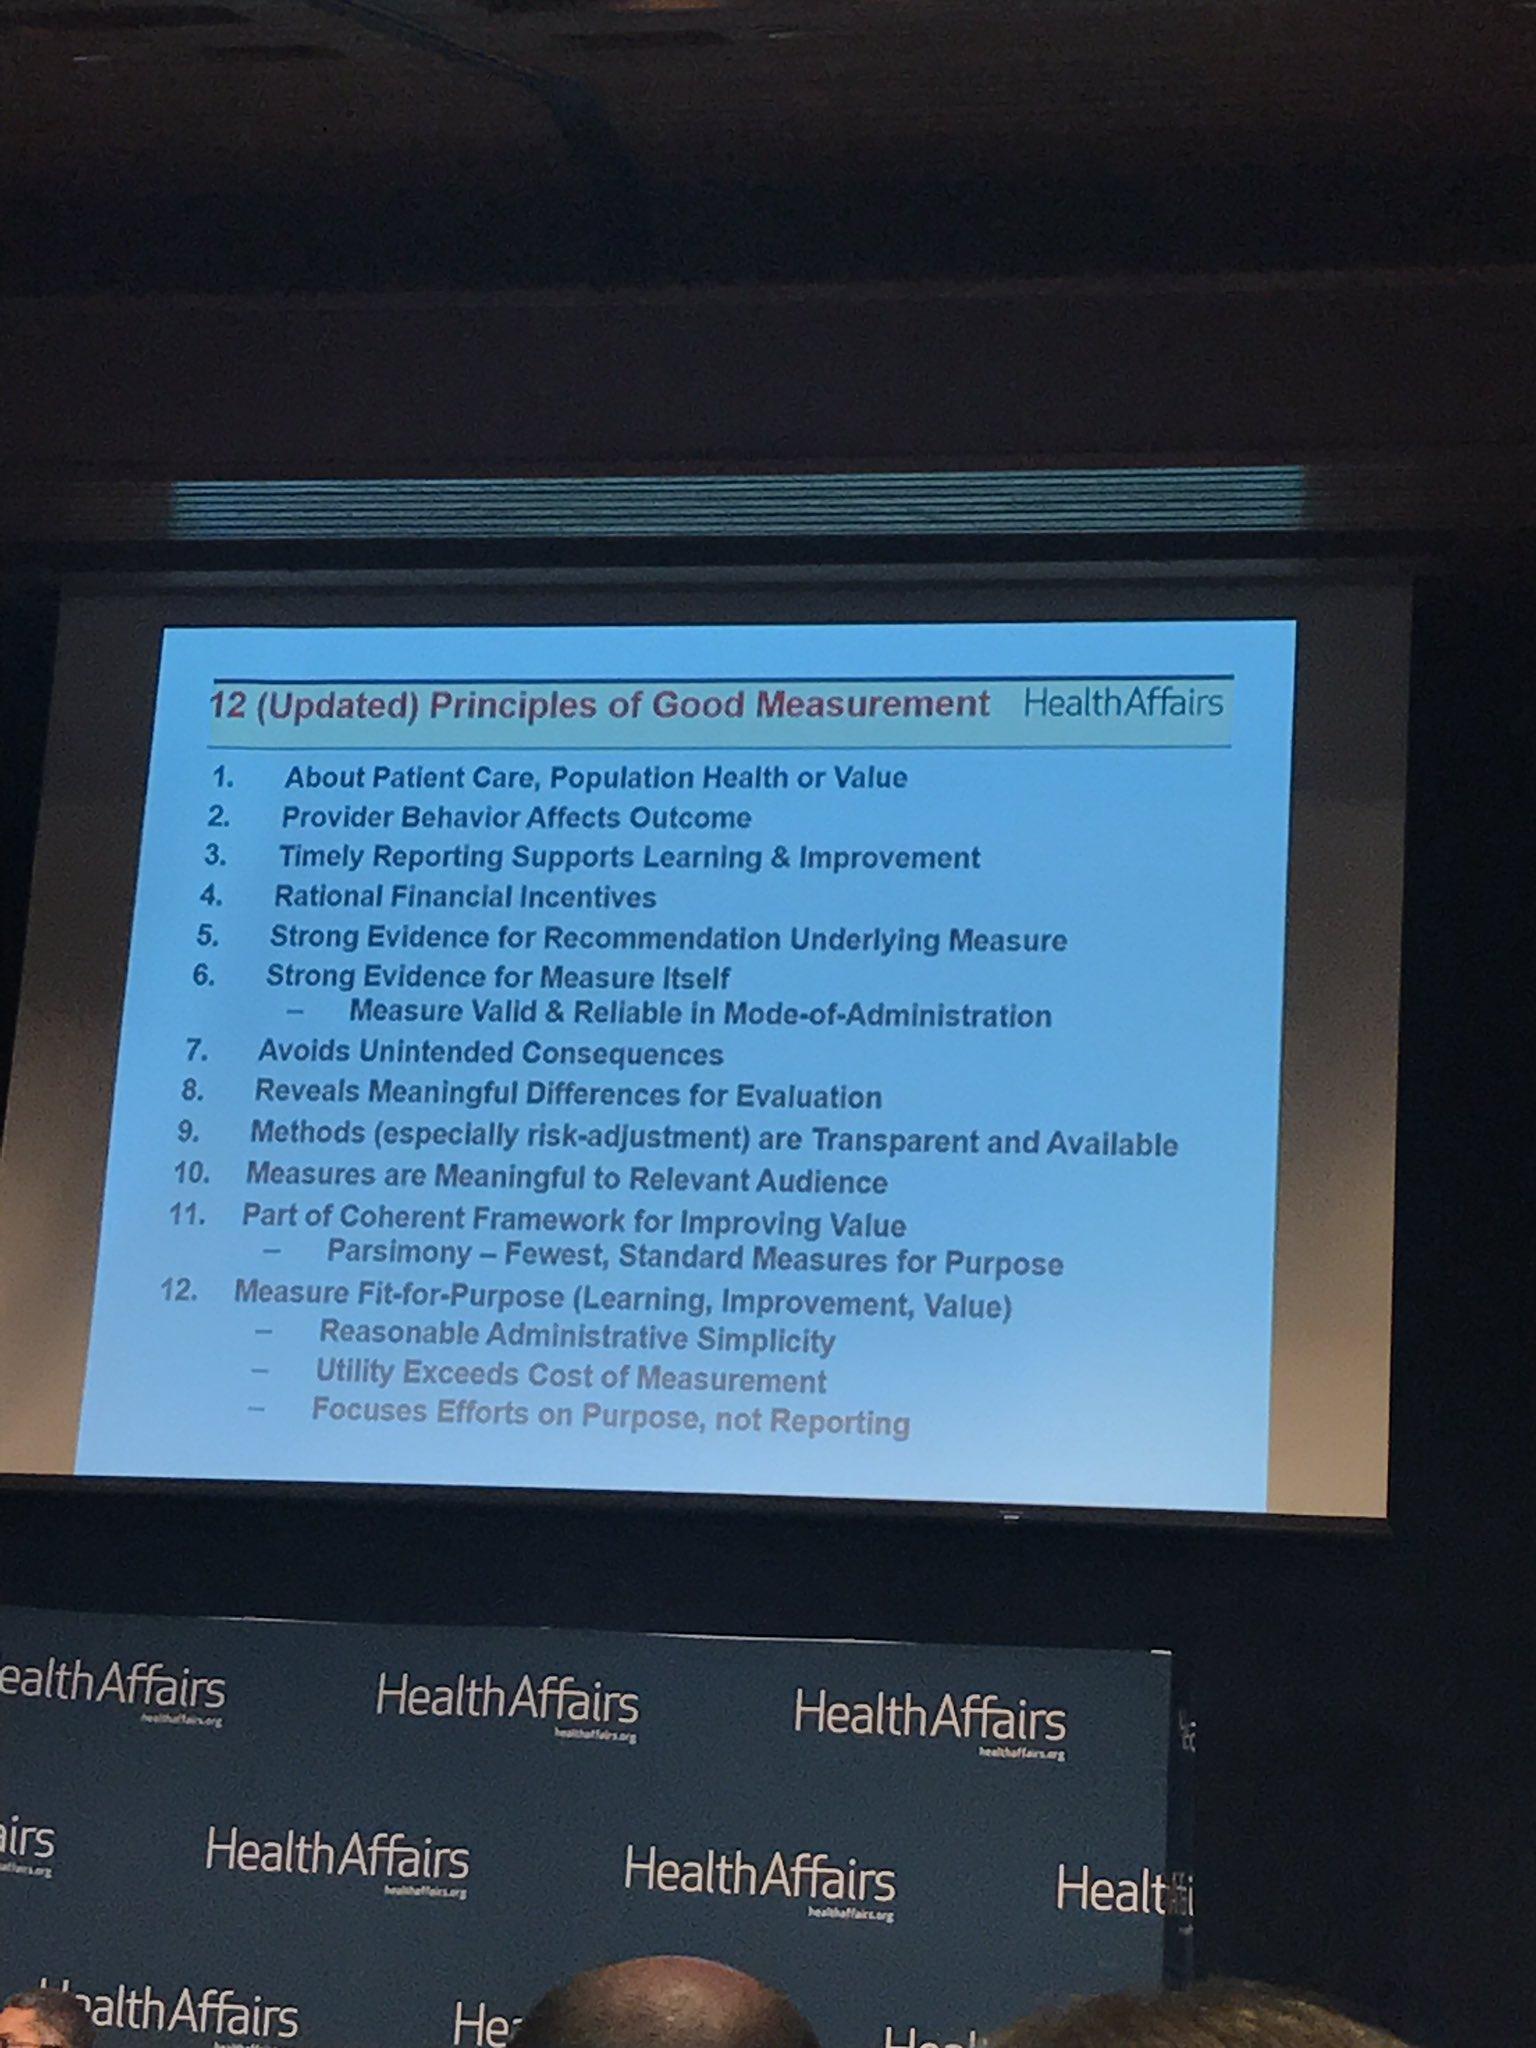 Updated Principles of Good Measurement slide from Jonathan Perlin #valuepayment https://t.co/vqh3h5geWC